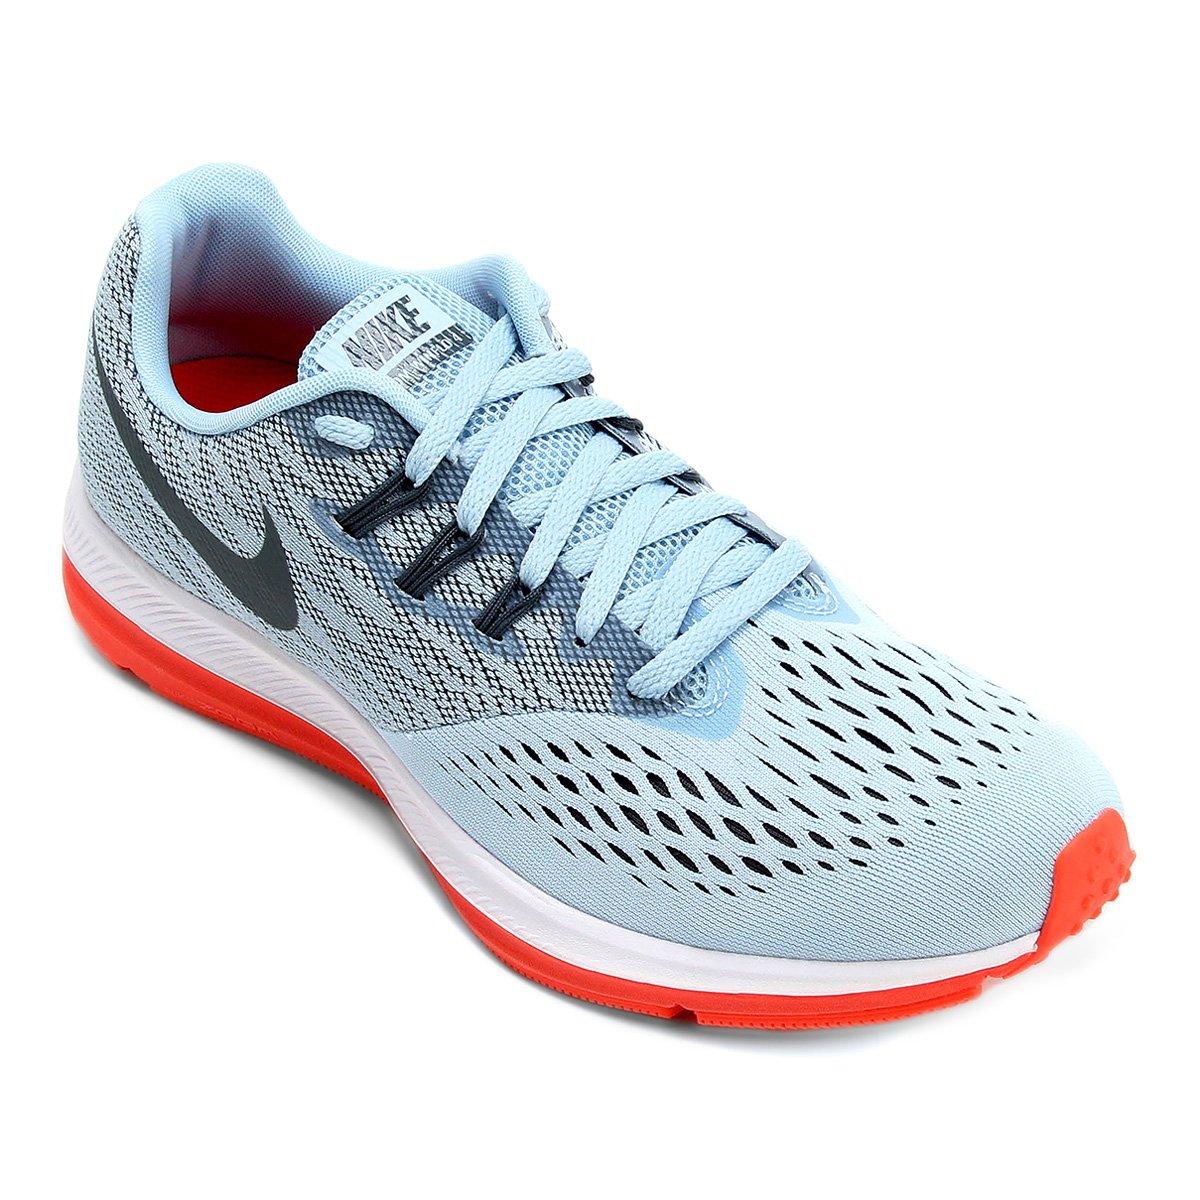 361f6a4b008 Tênis Nike Zoom Winflo 4 Masculino - Compre Agora